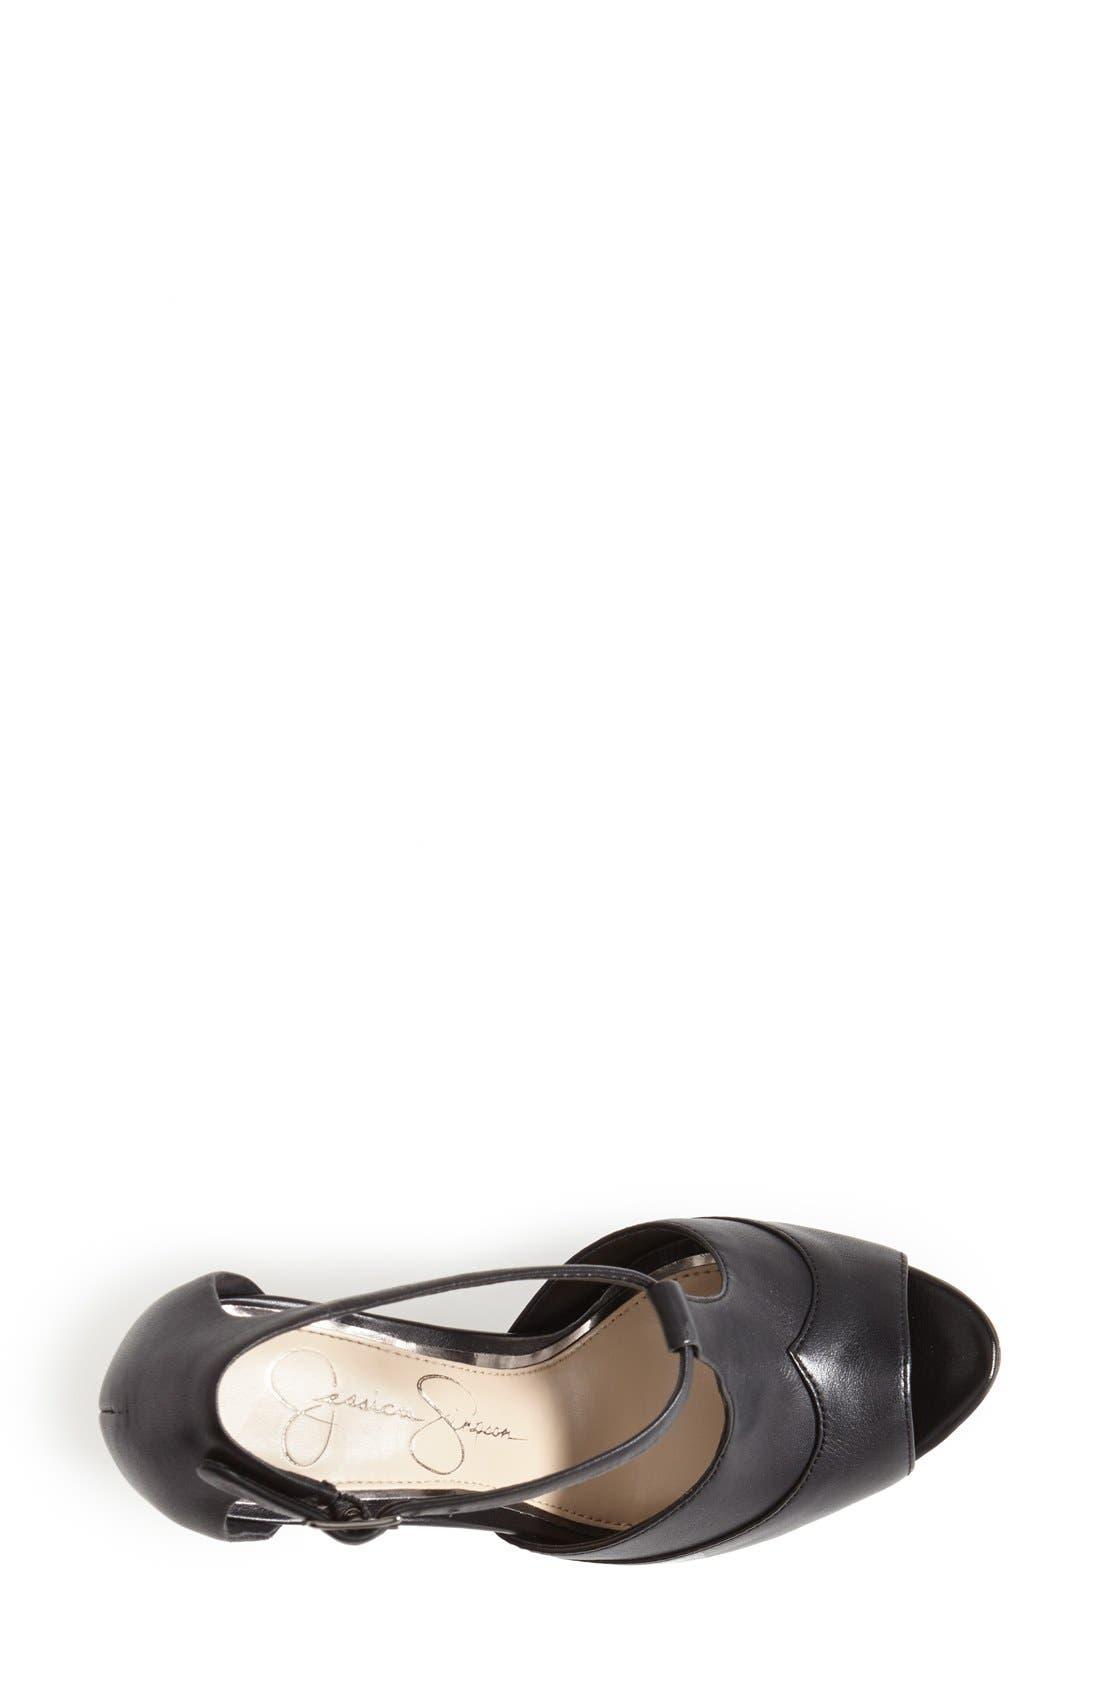 Alternate Image 3  - Jessica Simpson 'Dany' Sandal